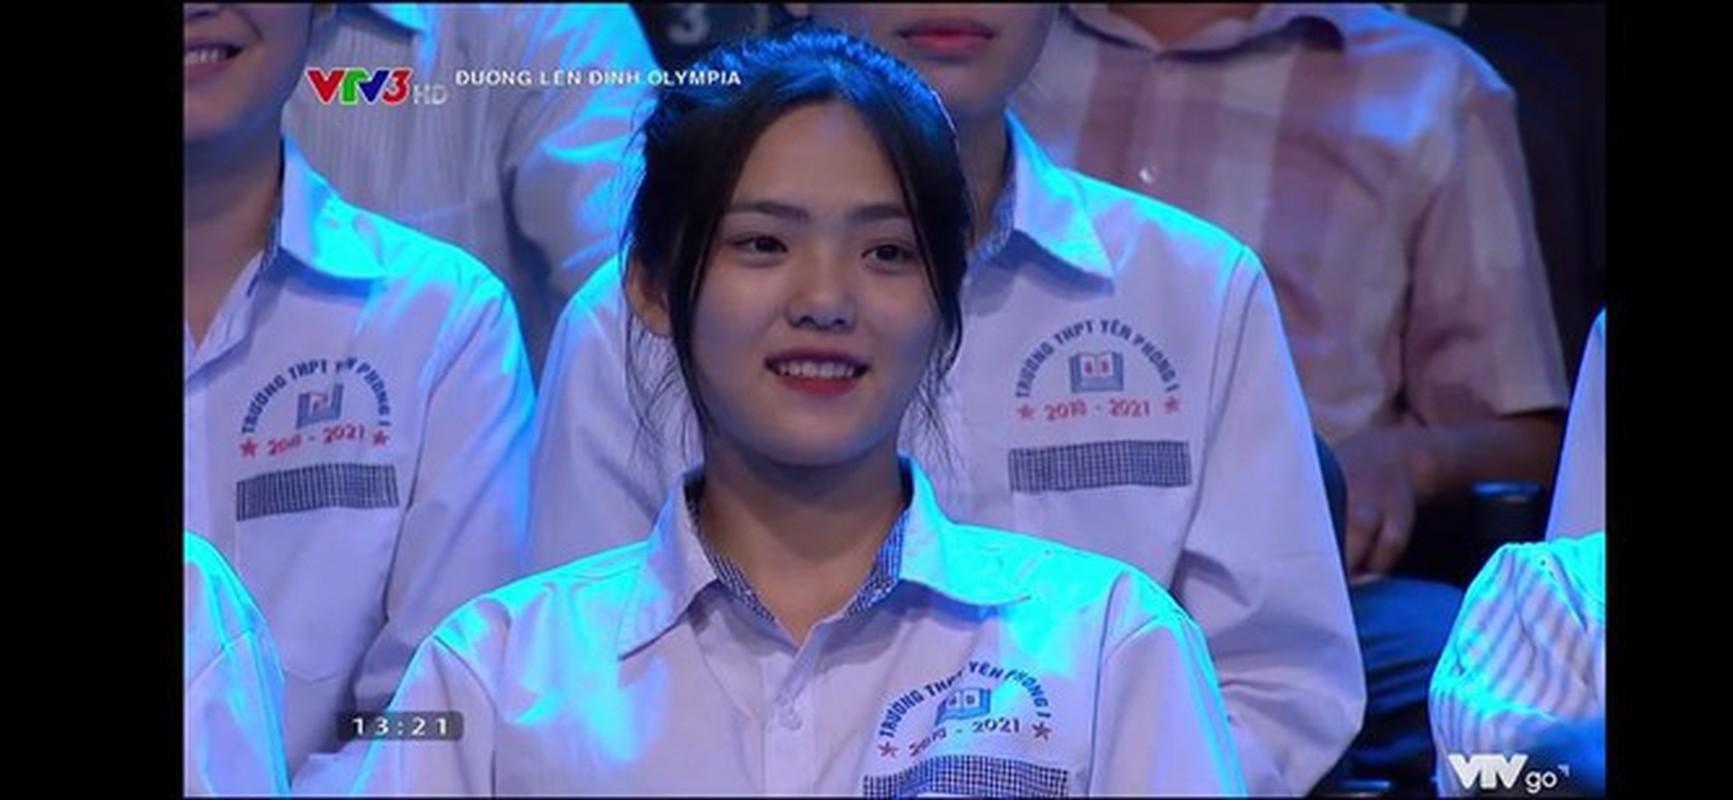 Len song Duong len dinh Olympia, dan hot girl lam bung sang khung hinh-Hinh-9